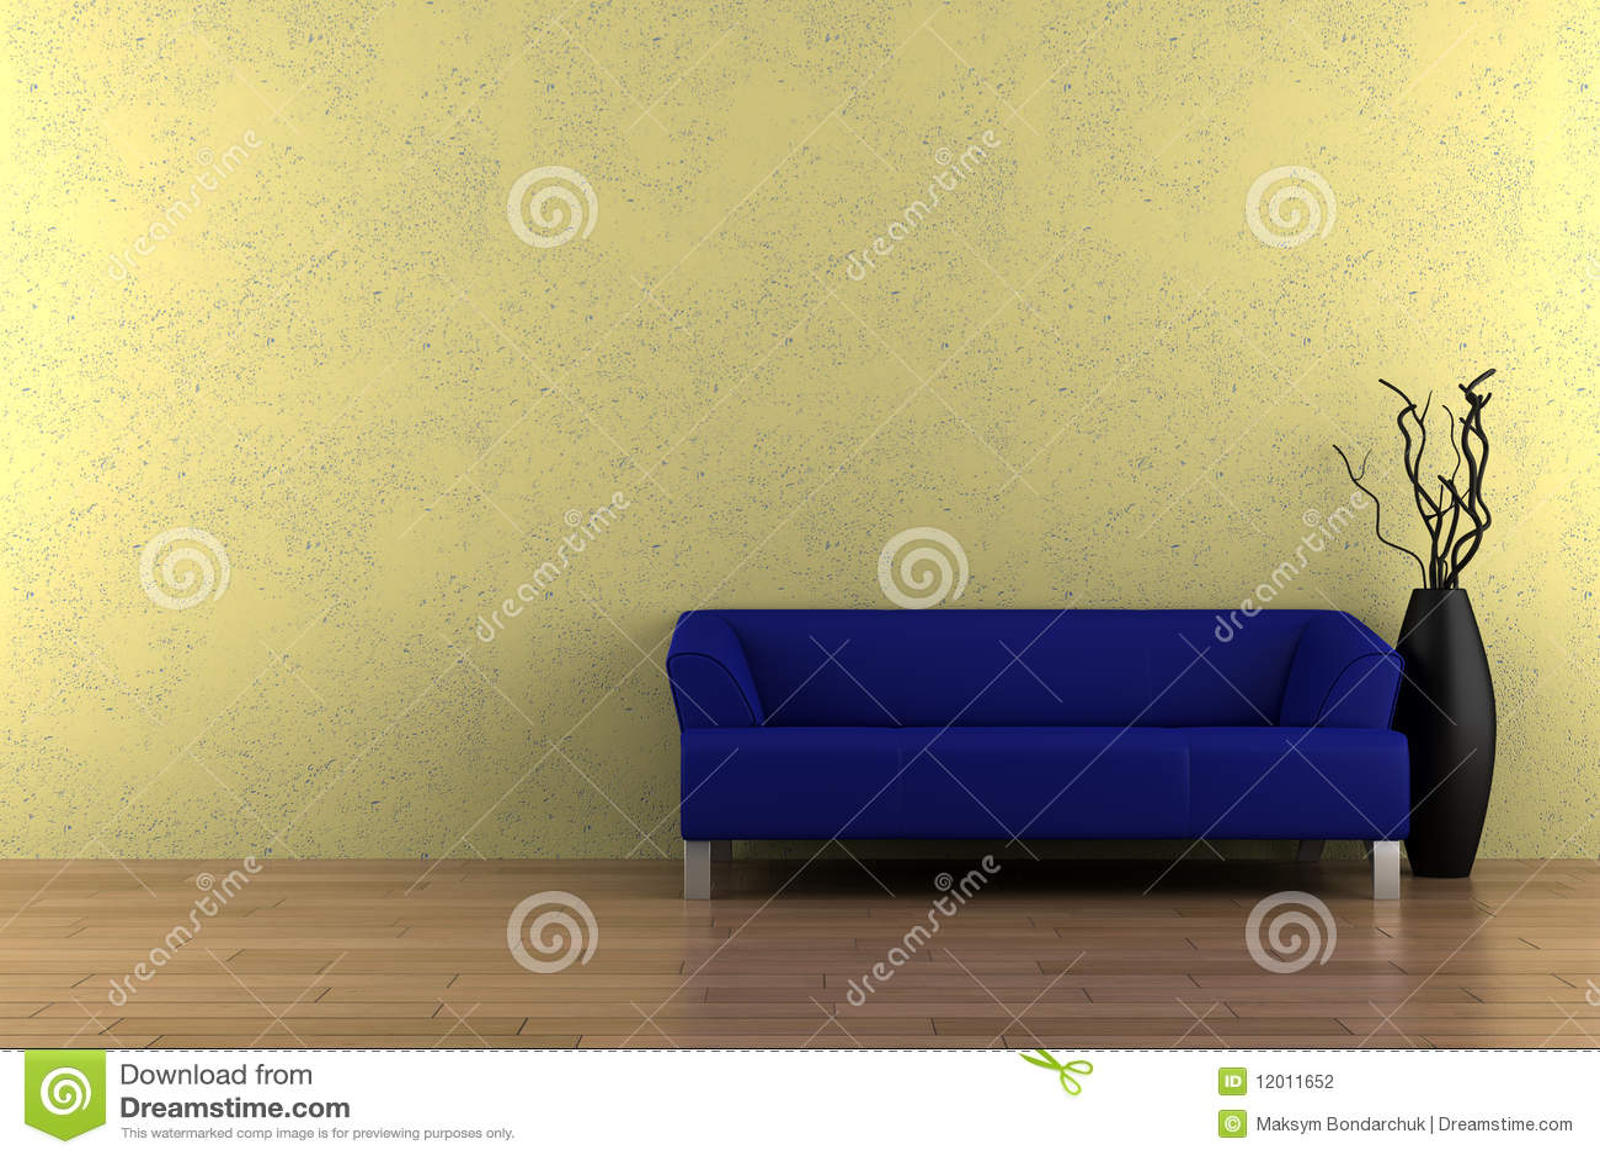 royaltyfree stock photo download blue sofa